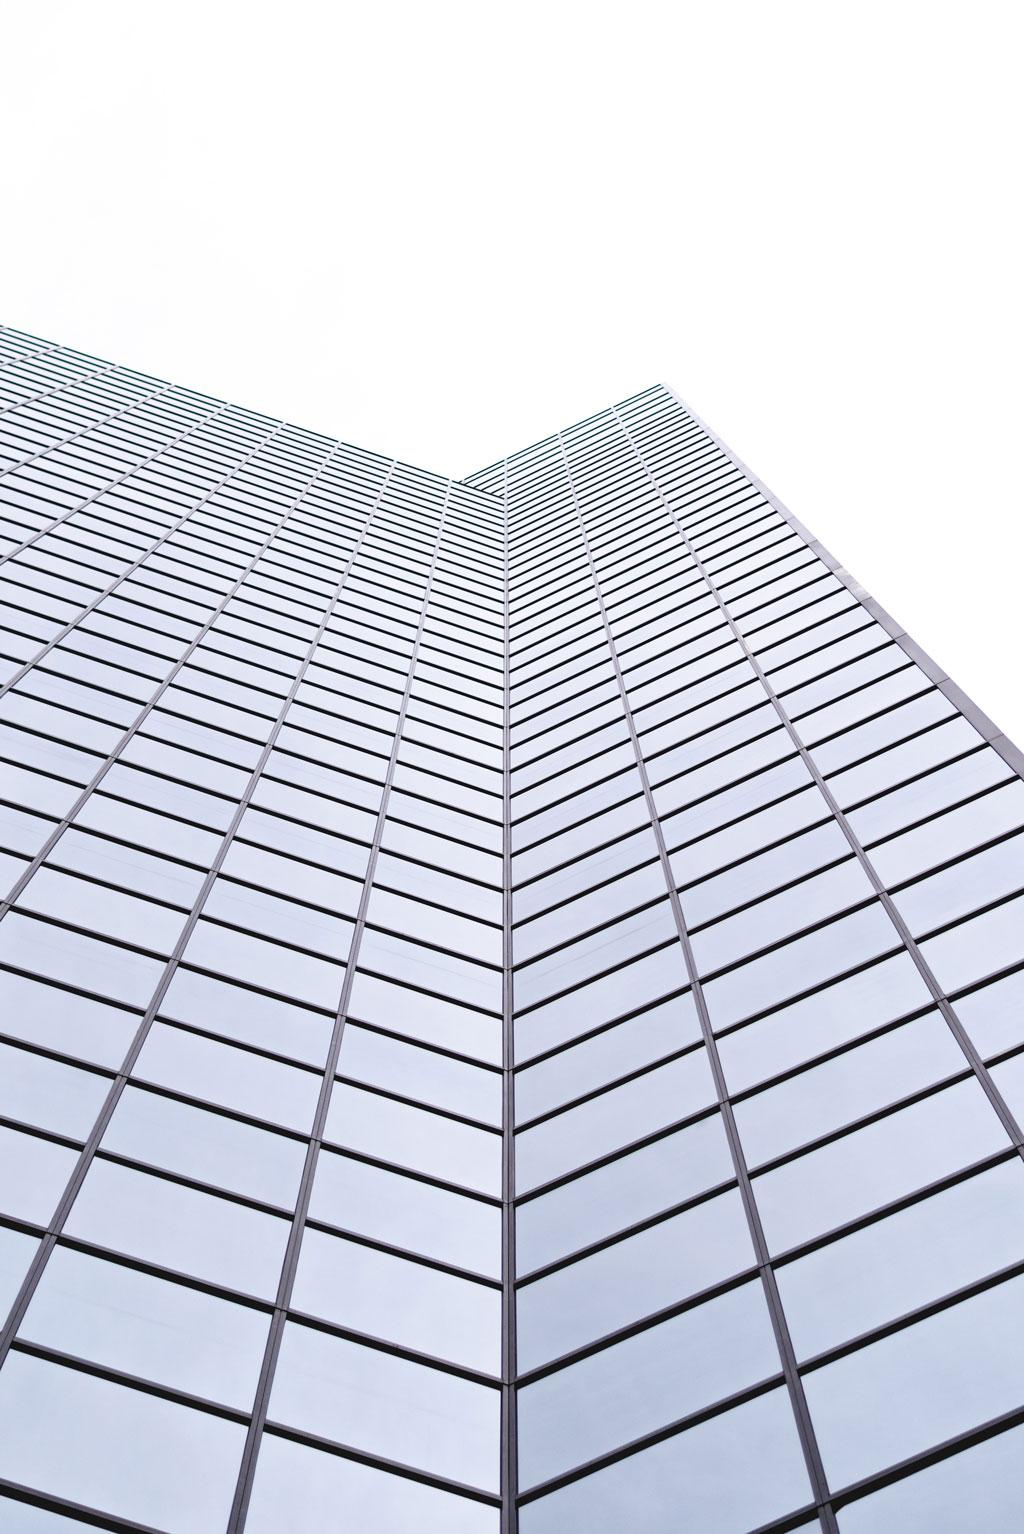 Skyscraper covered in windows against a white sky